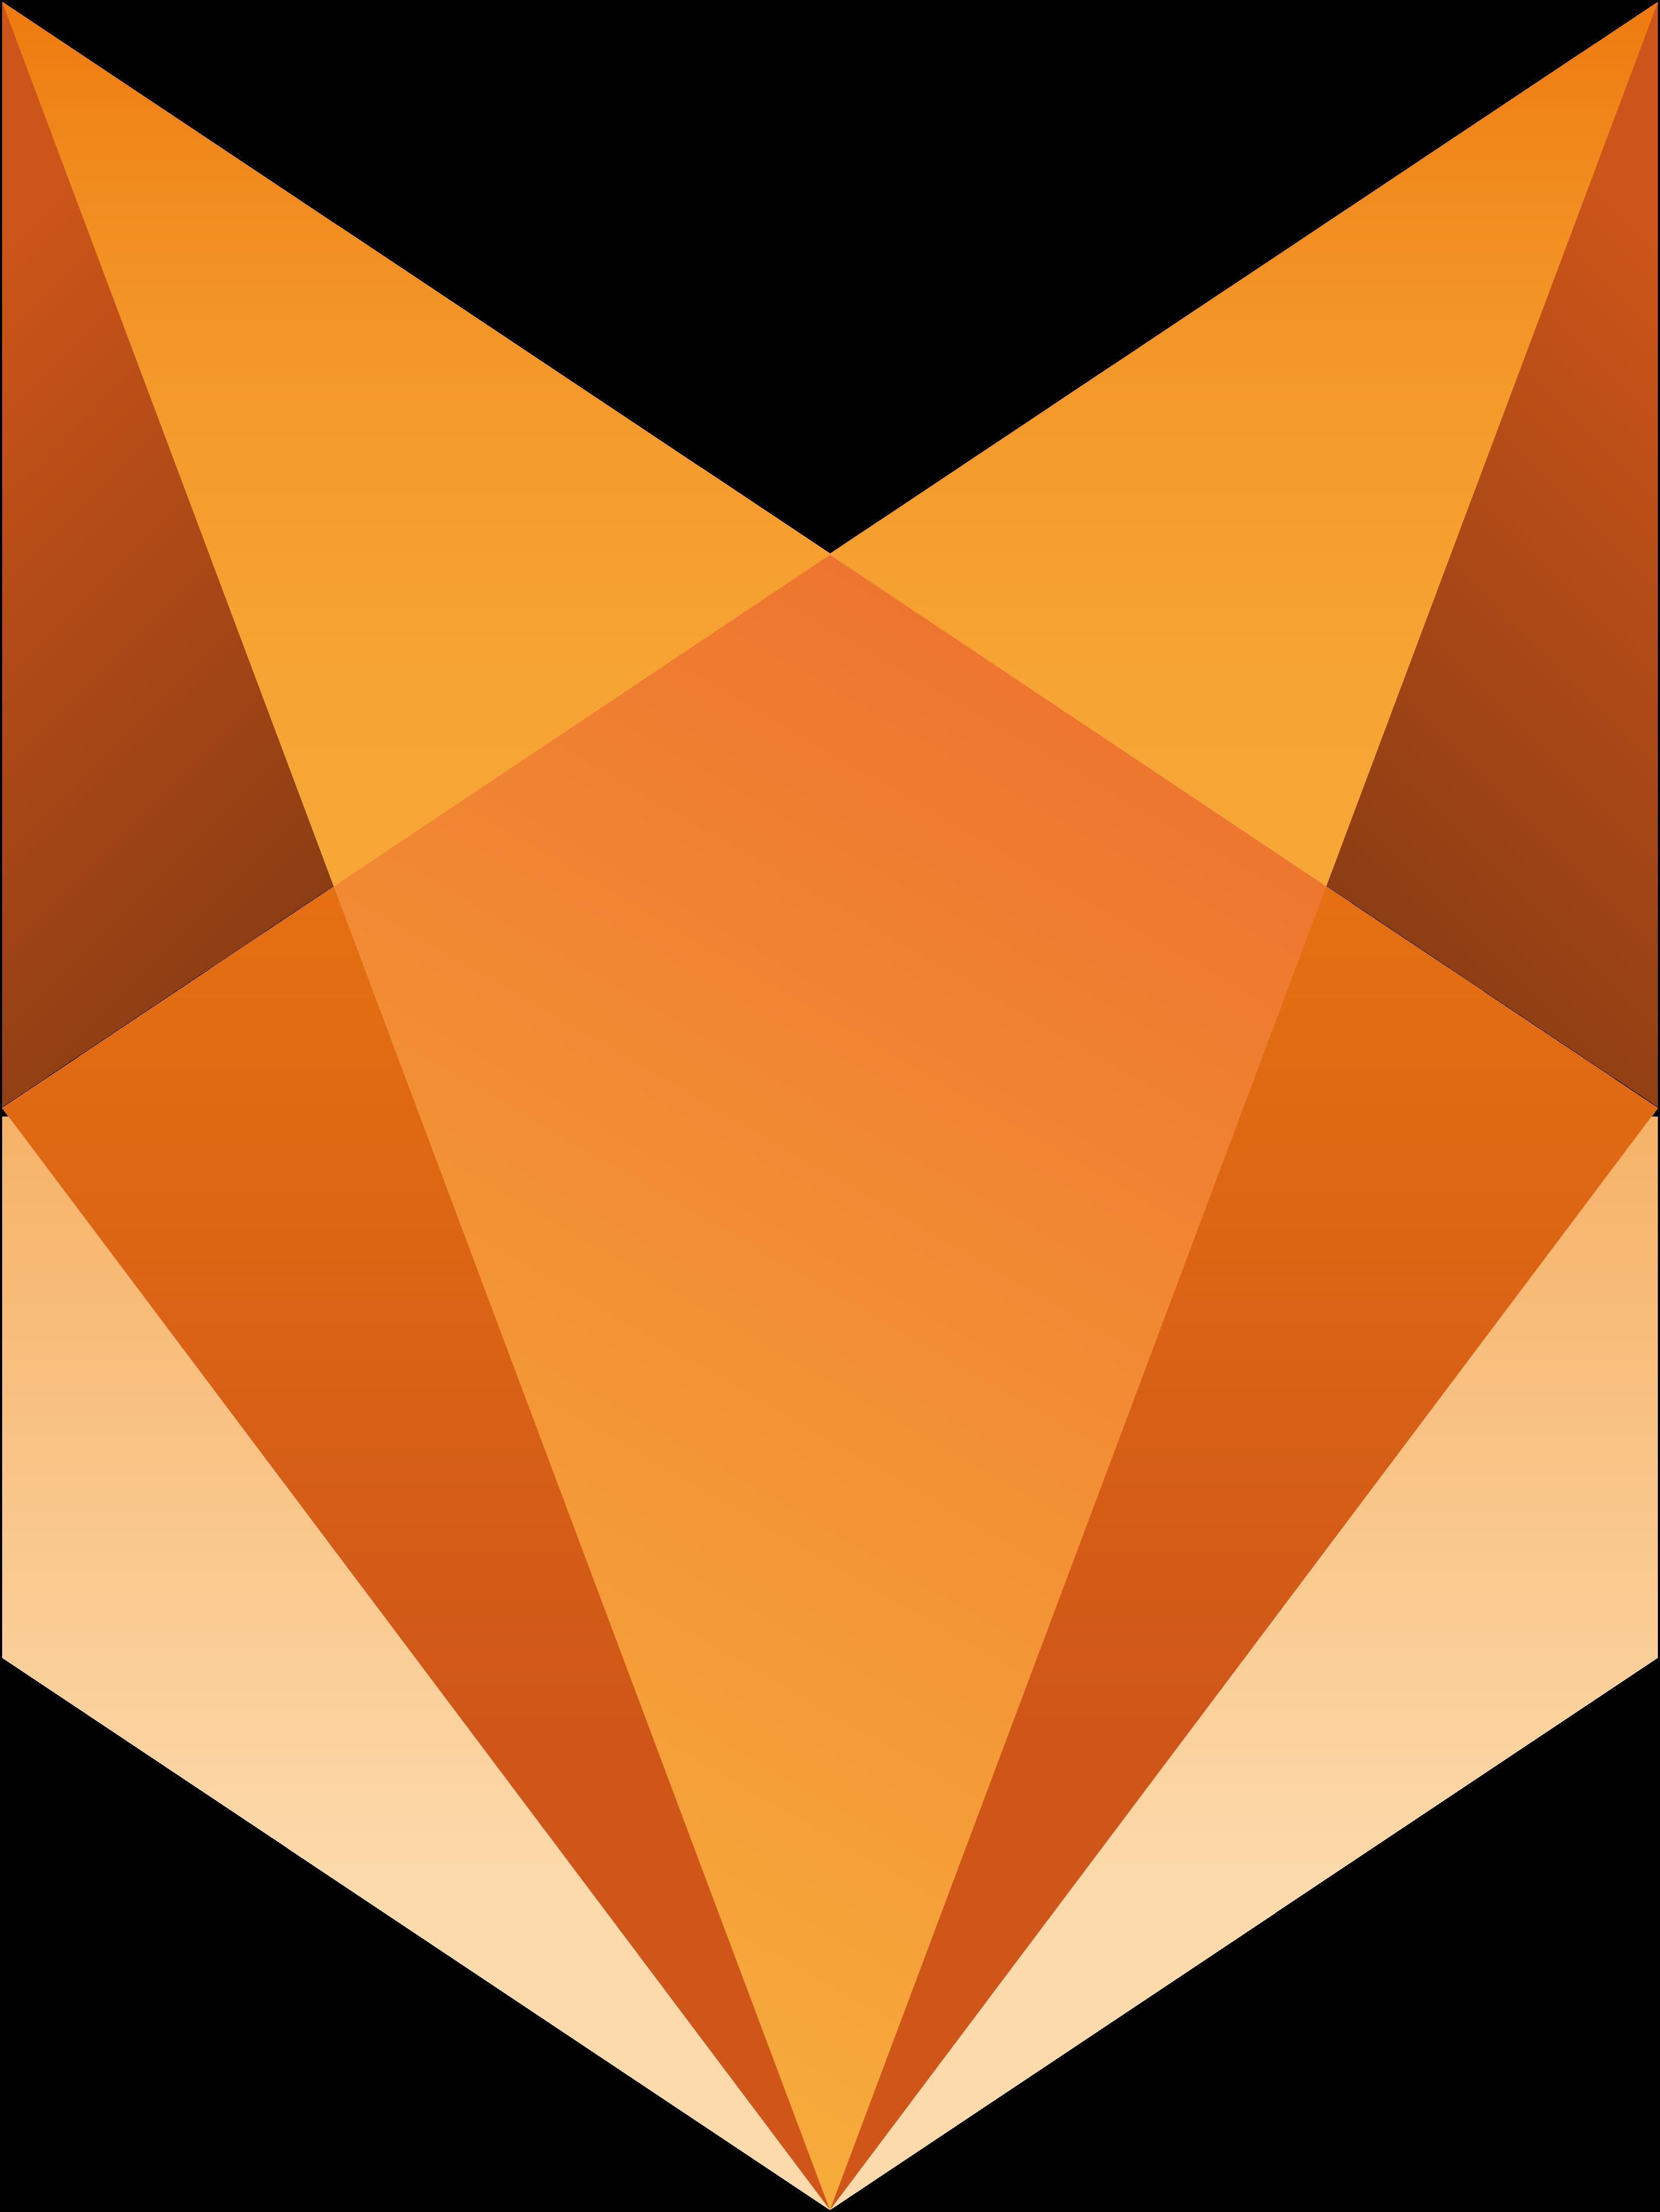 Foxpoint Webentwicklung